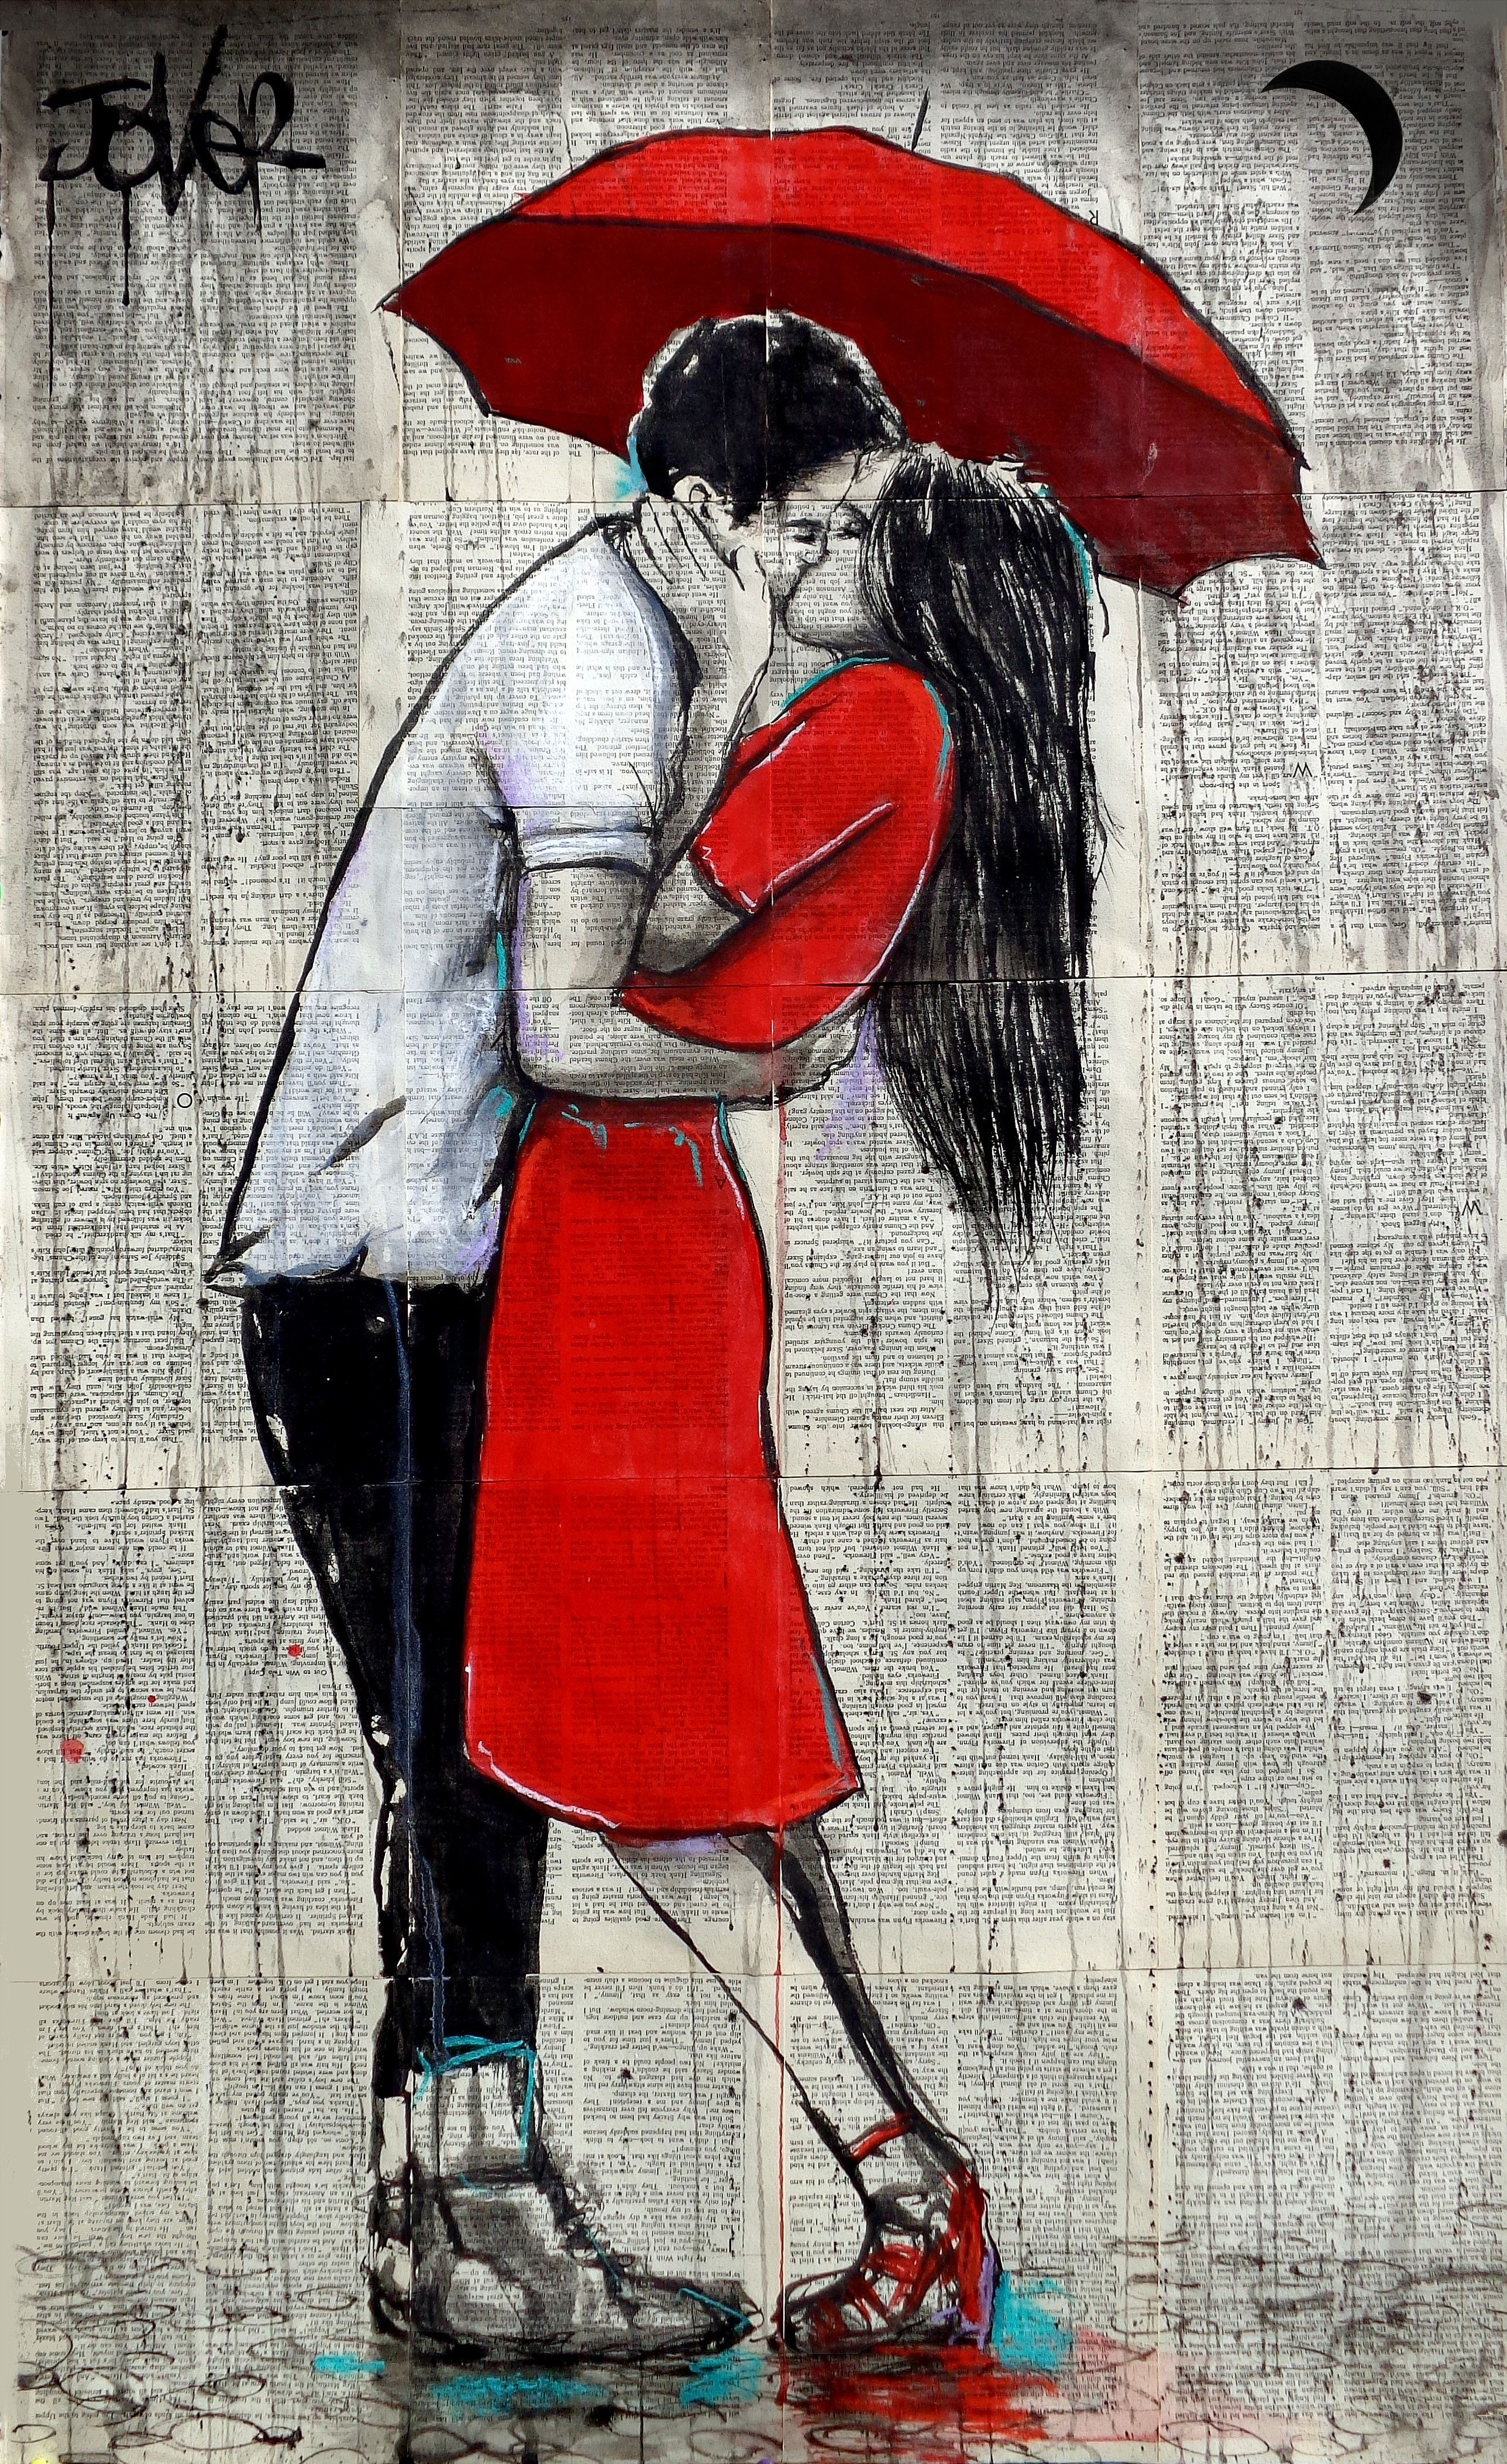 Final Kiss By Loui Jover Paintings For Sale Bluethumb Online Art Gallery Loui Jover Art Romantic Art Romance Art